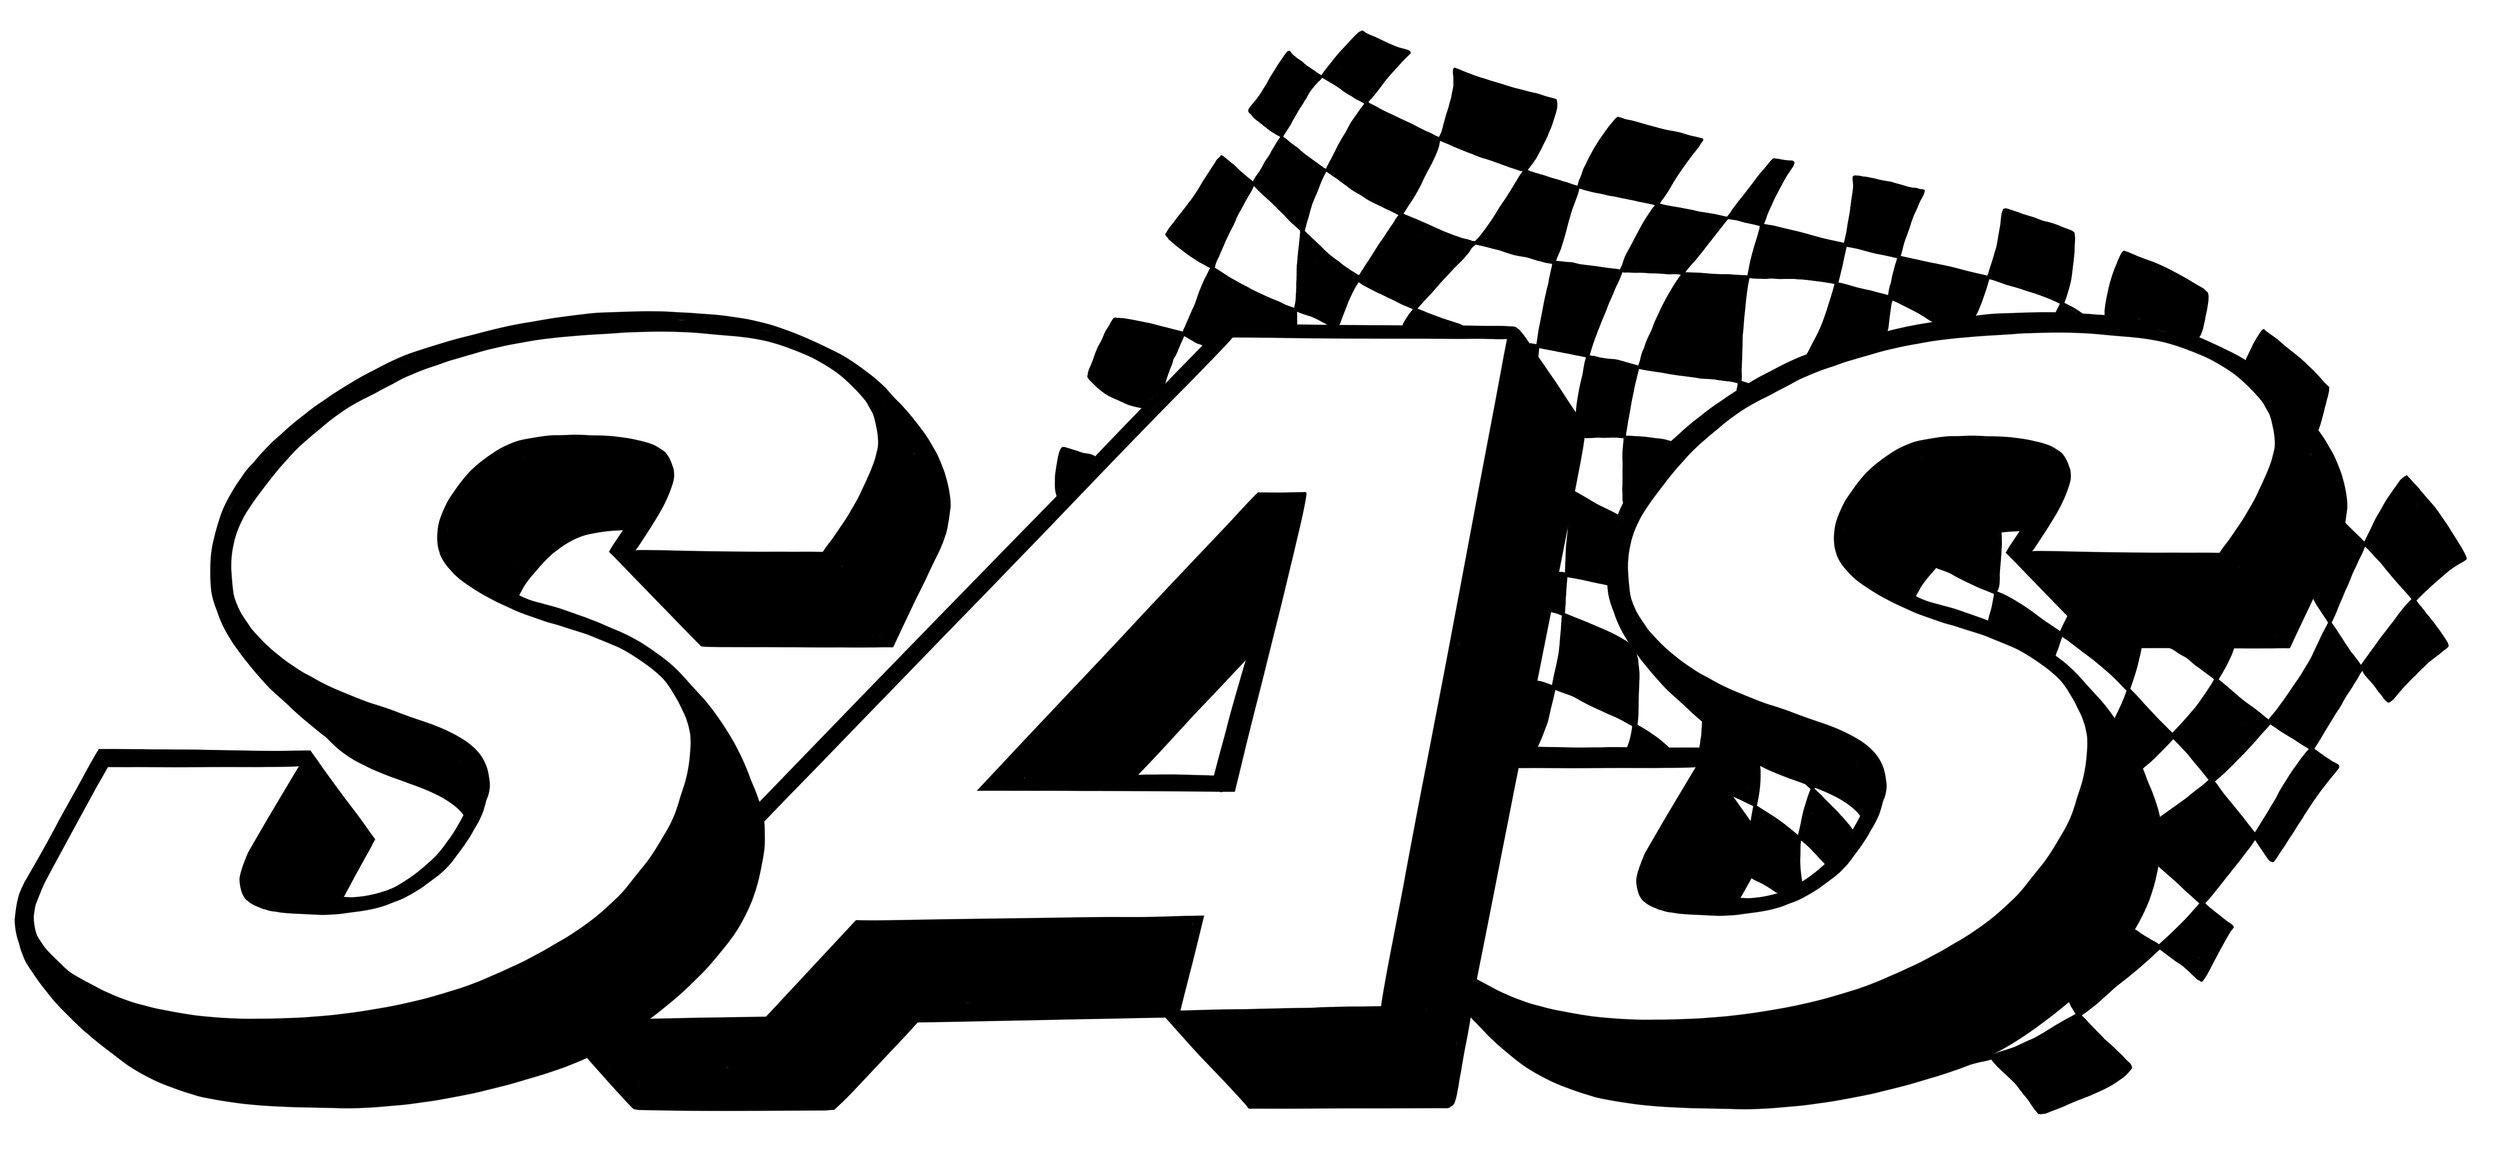 SAS - Flat.jpg